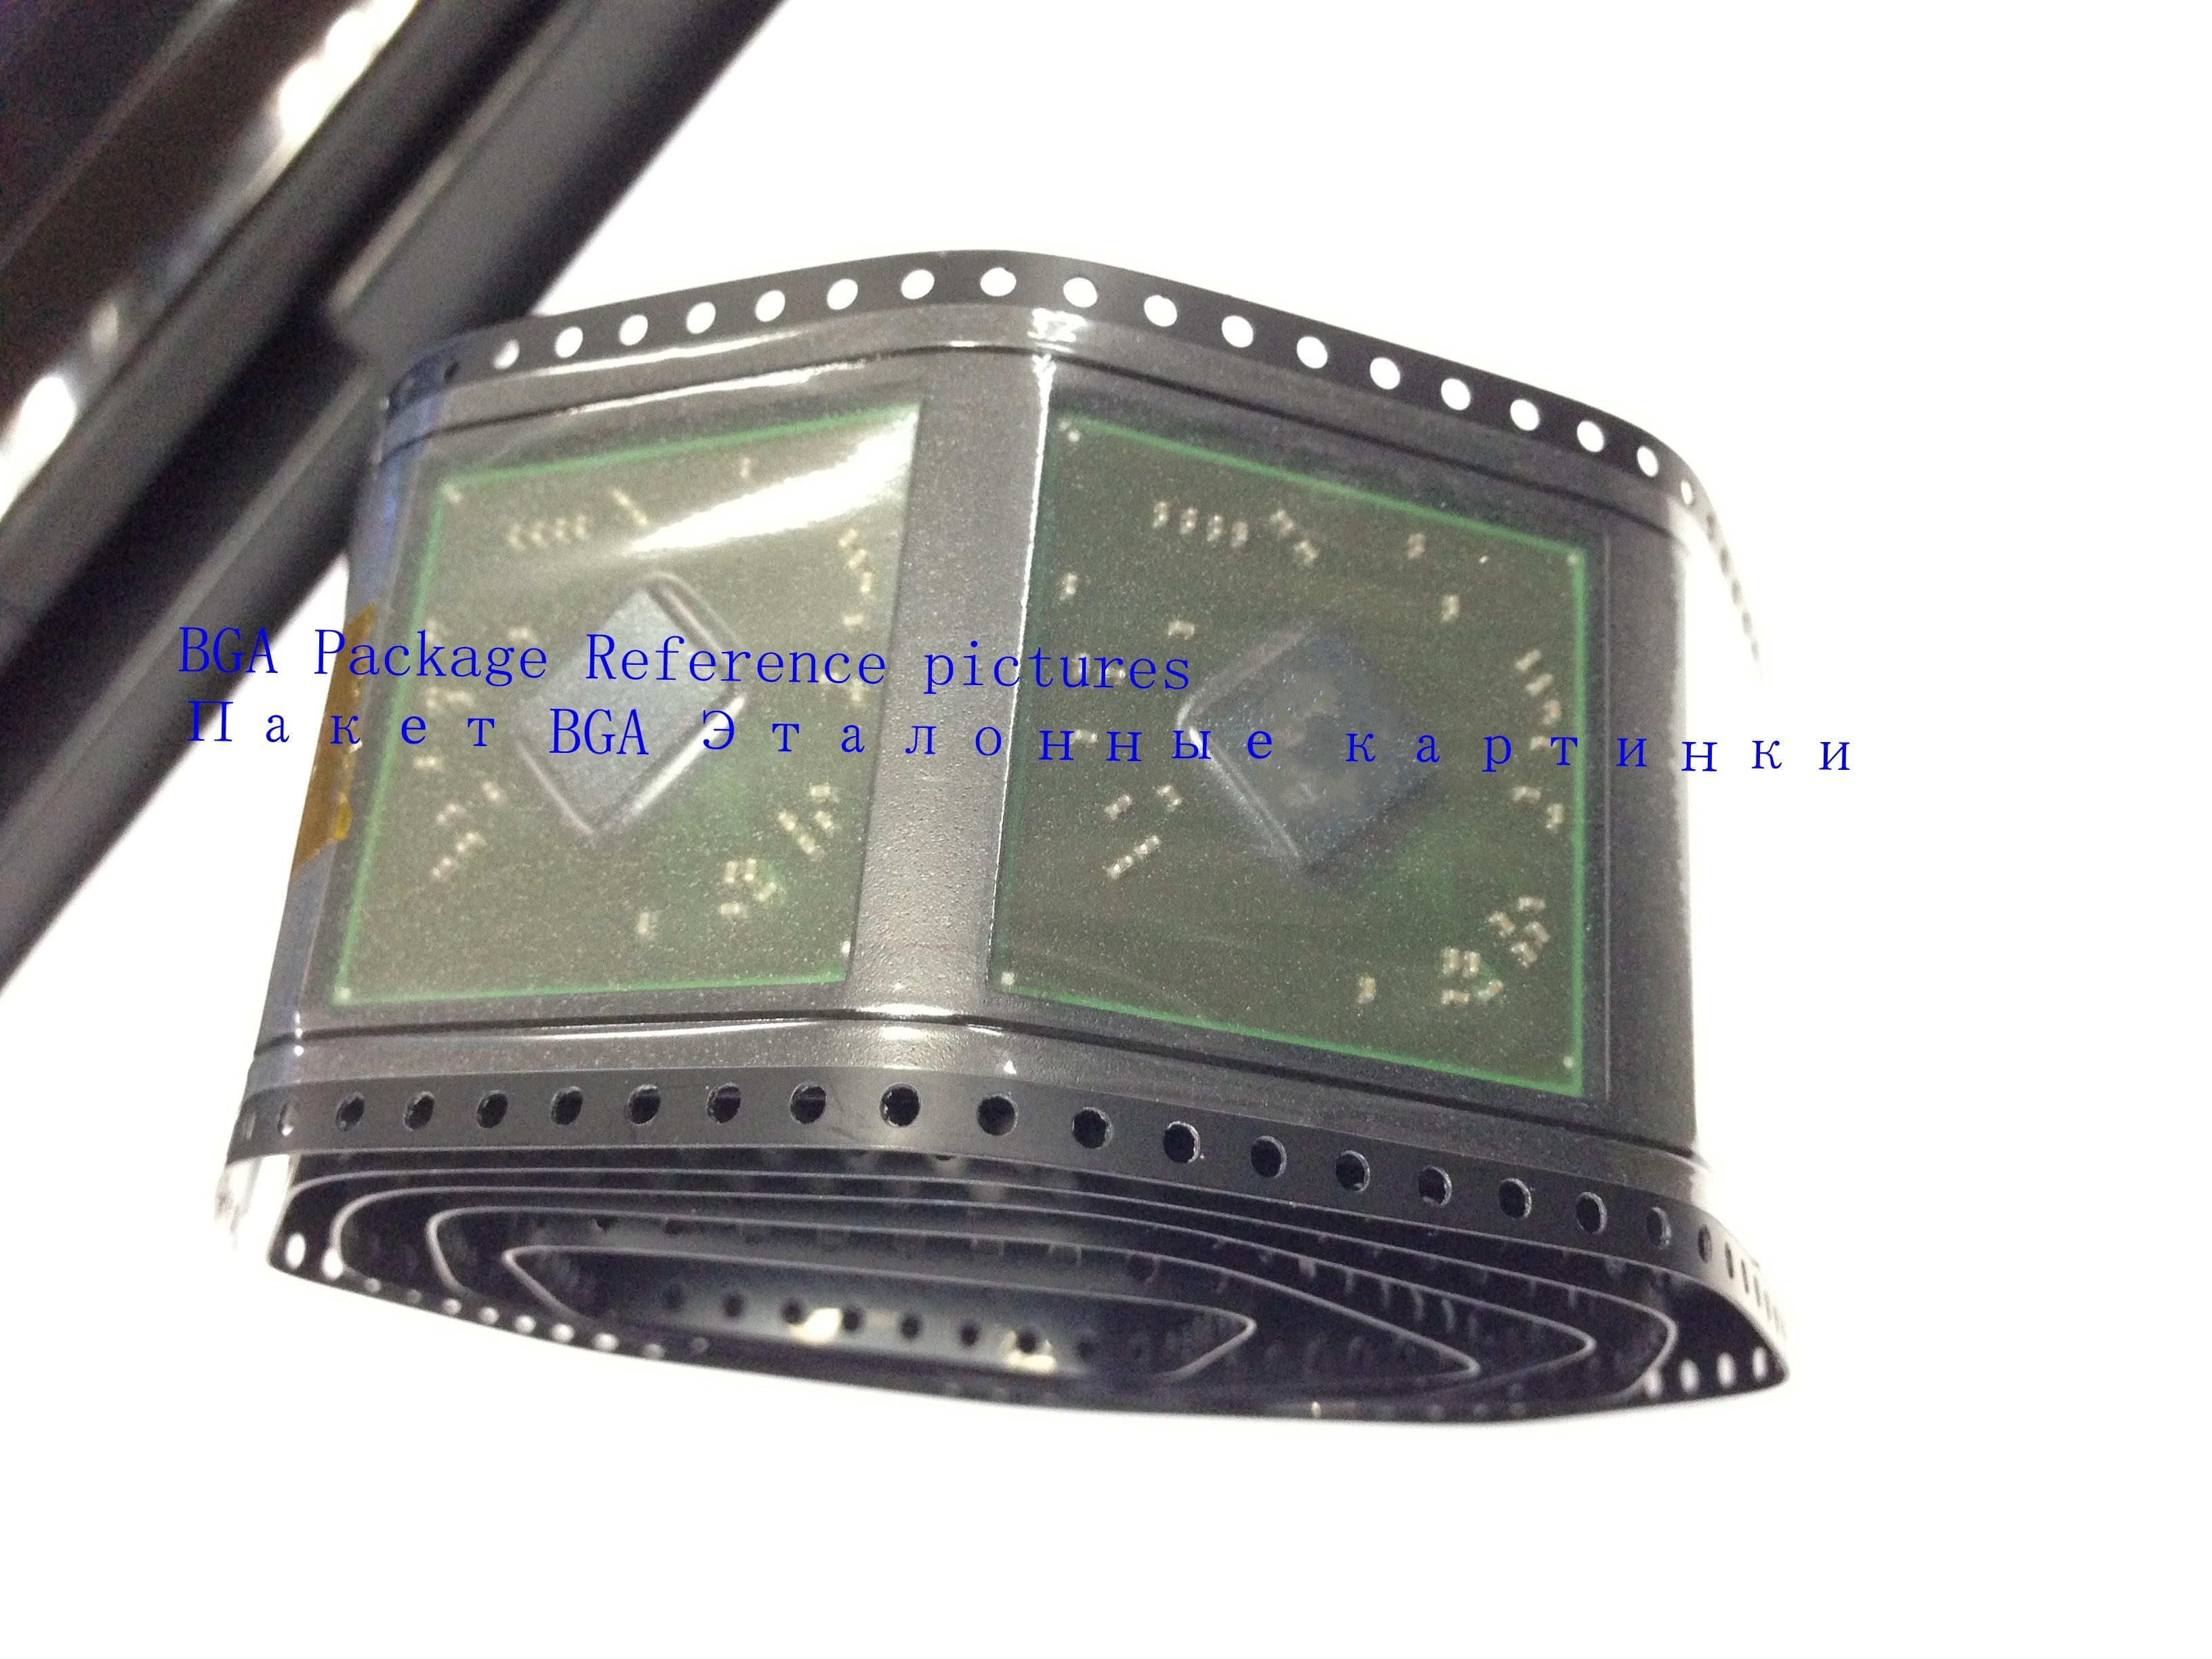 1pcs/lot 100% New i5-4200H SR15G i5 4200H BGA Chipset1pcs/lot 100% New i5-4200H SR15G i5 4200H BGA Chipset